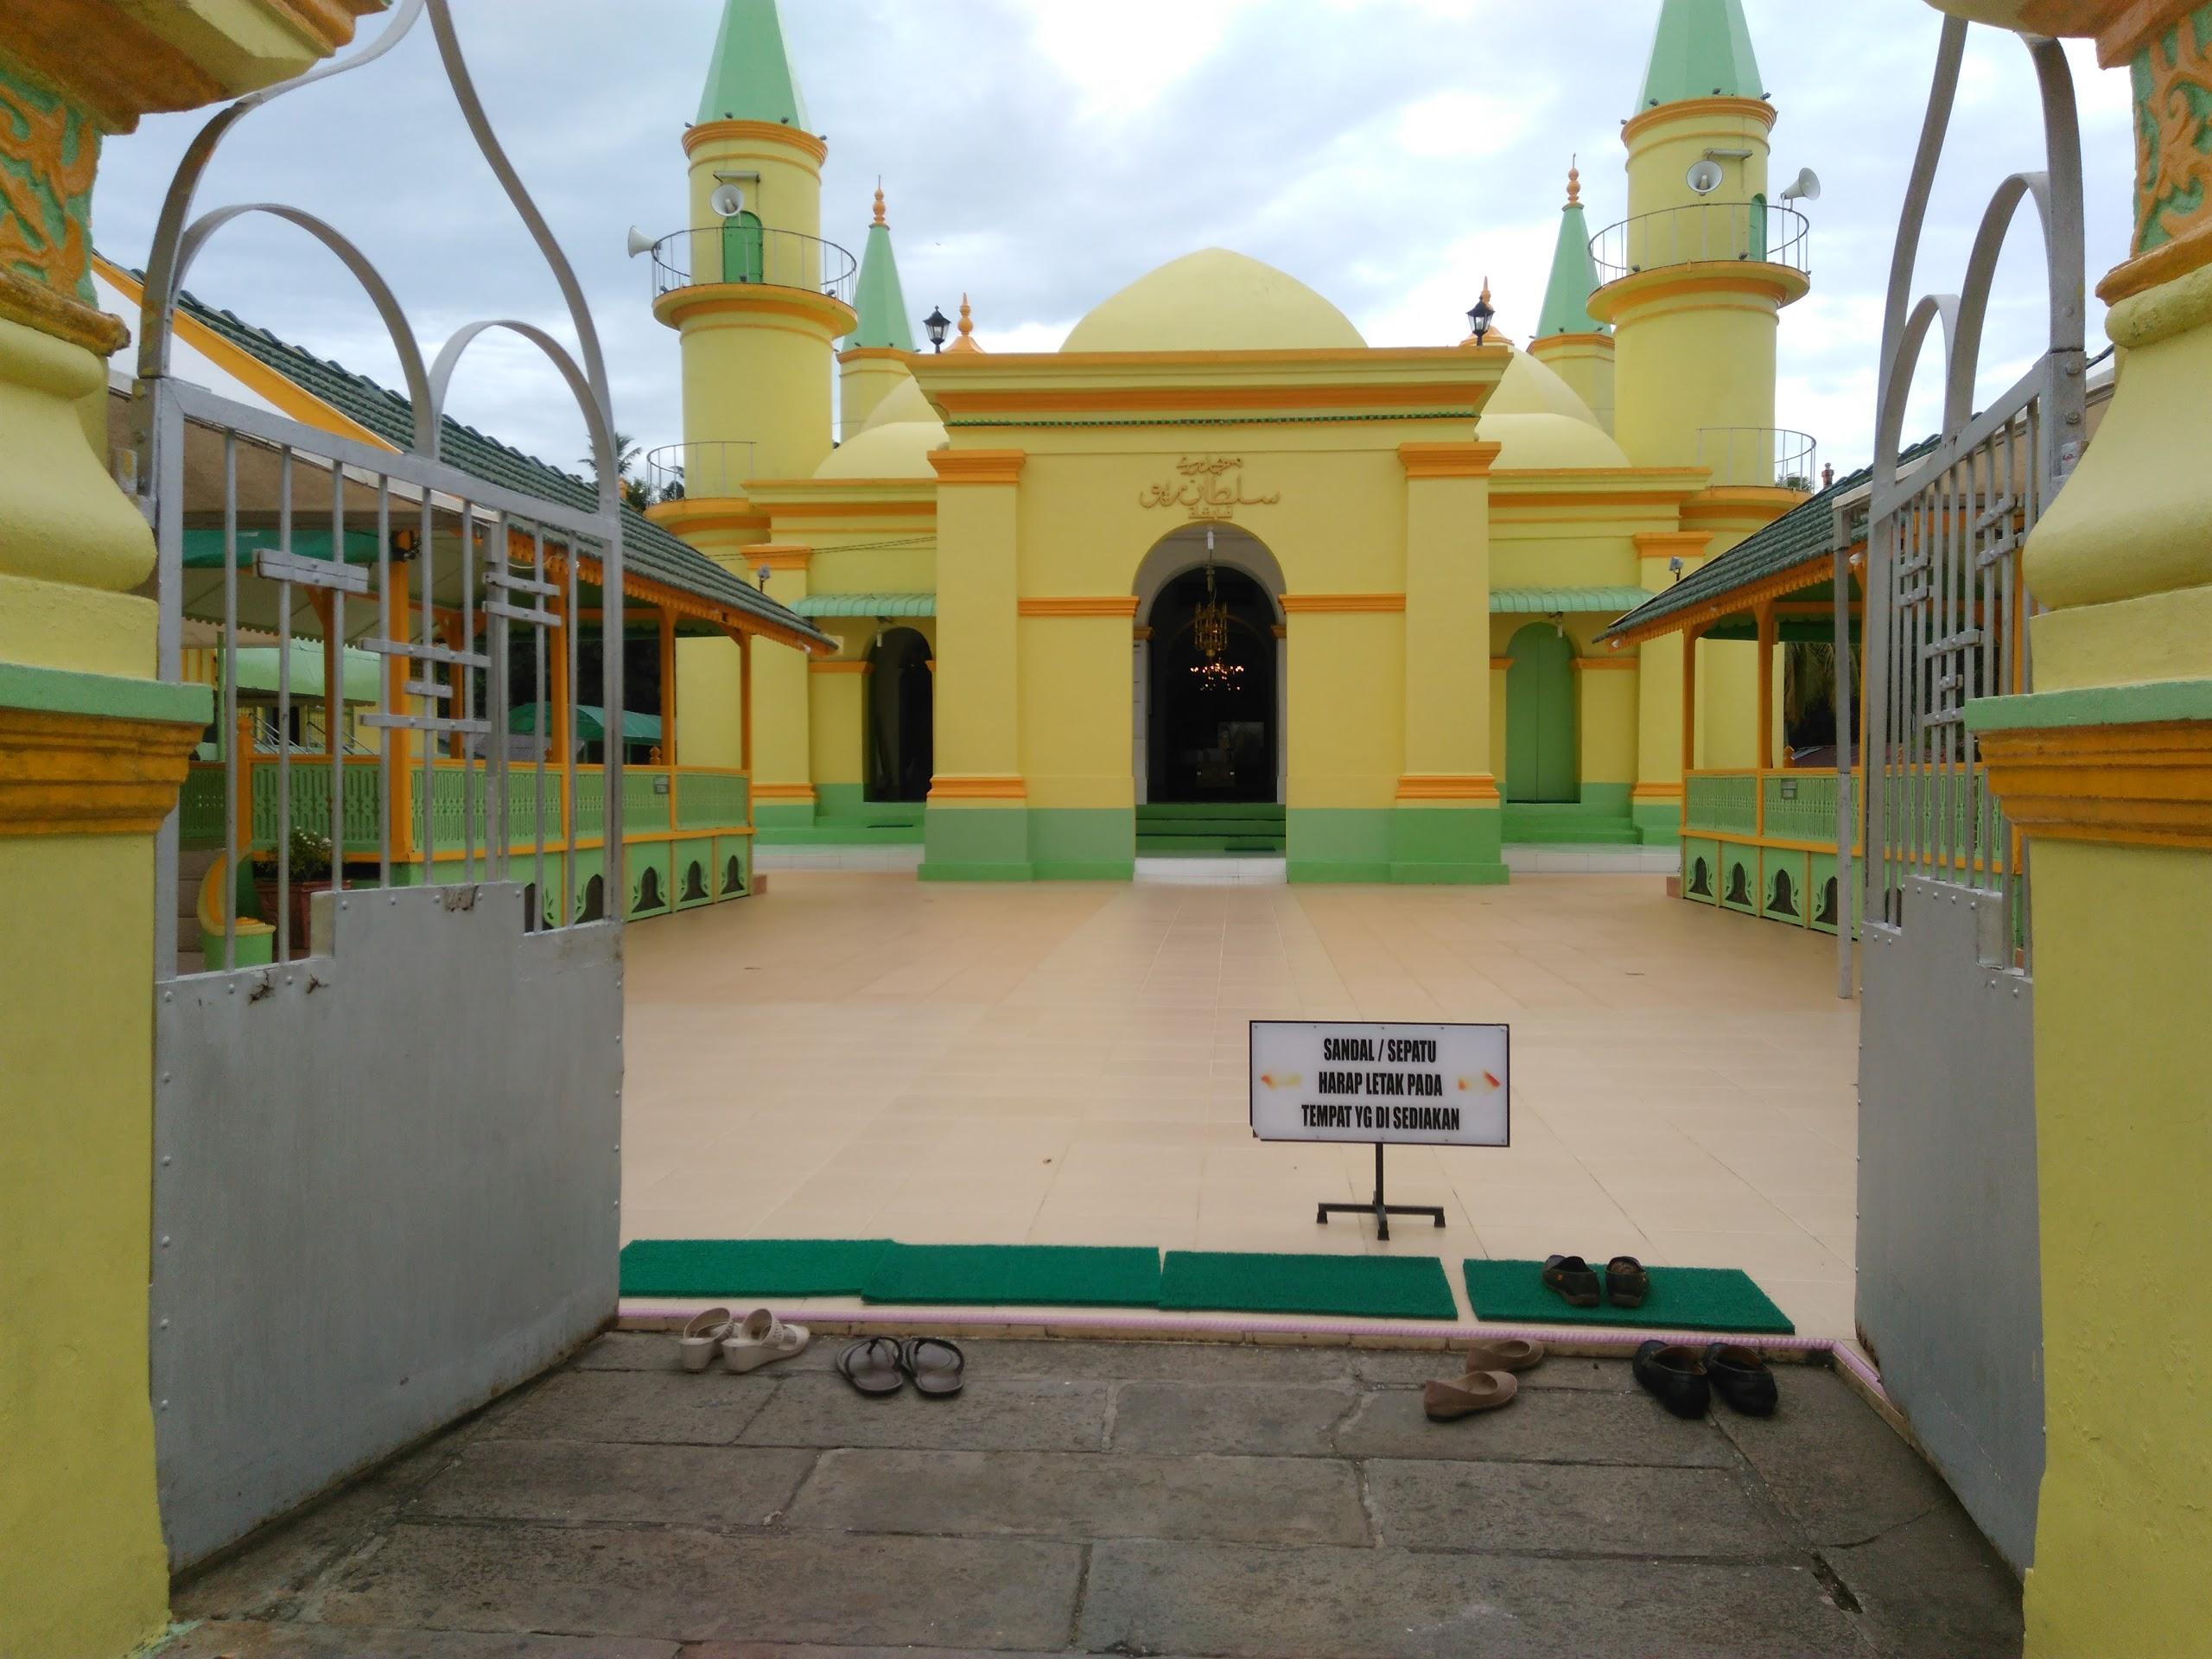 8 Tempat Wisata Wajib Kunjung Tanjungpinang Kepulauan Riau Warna Kuning